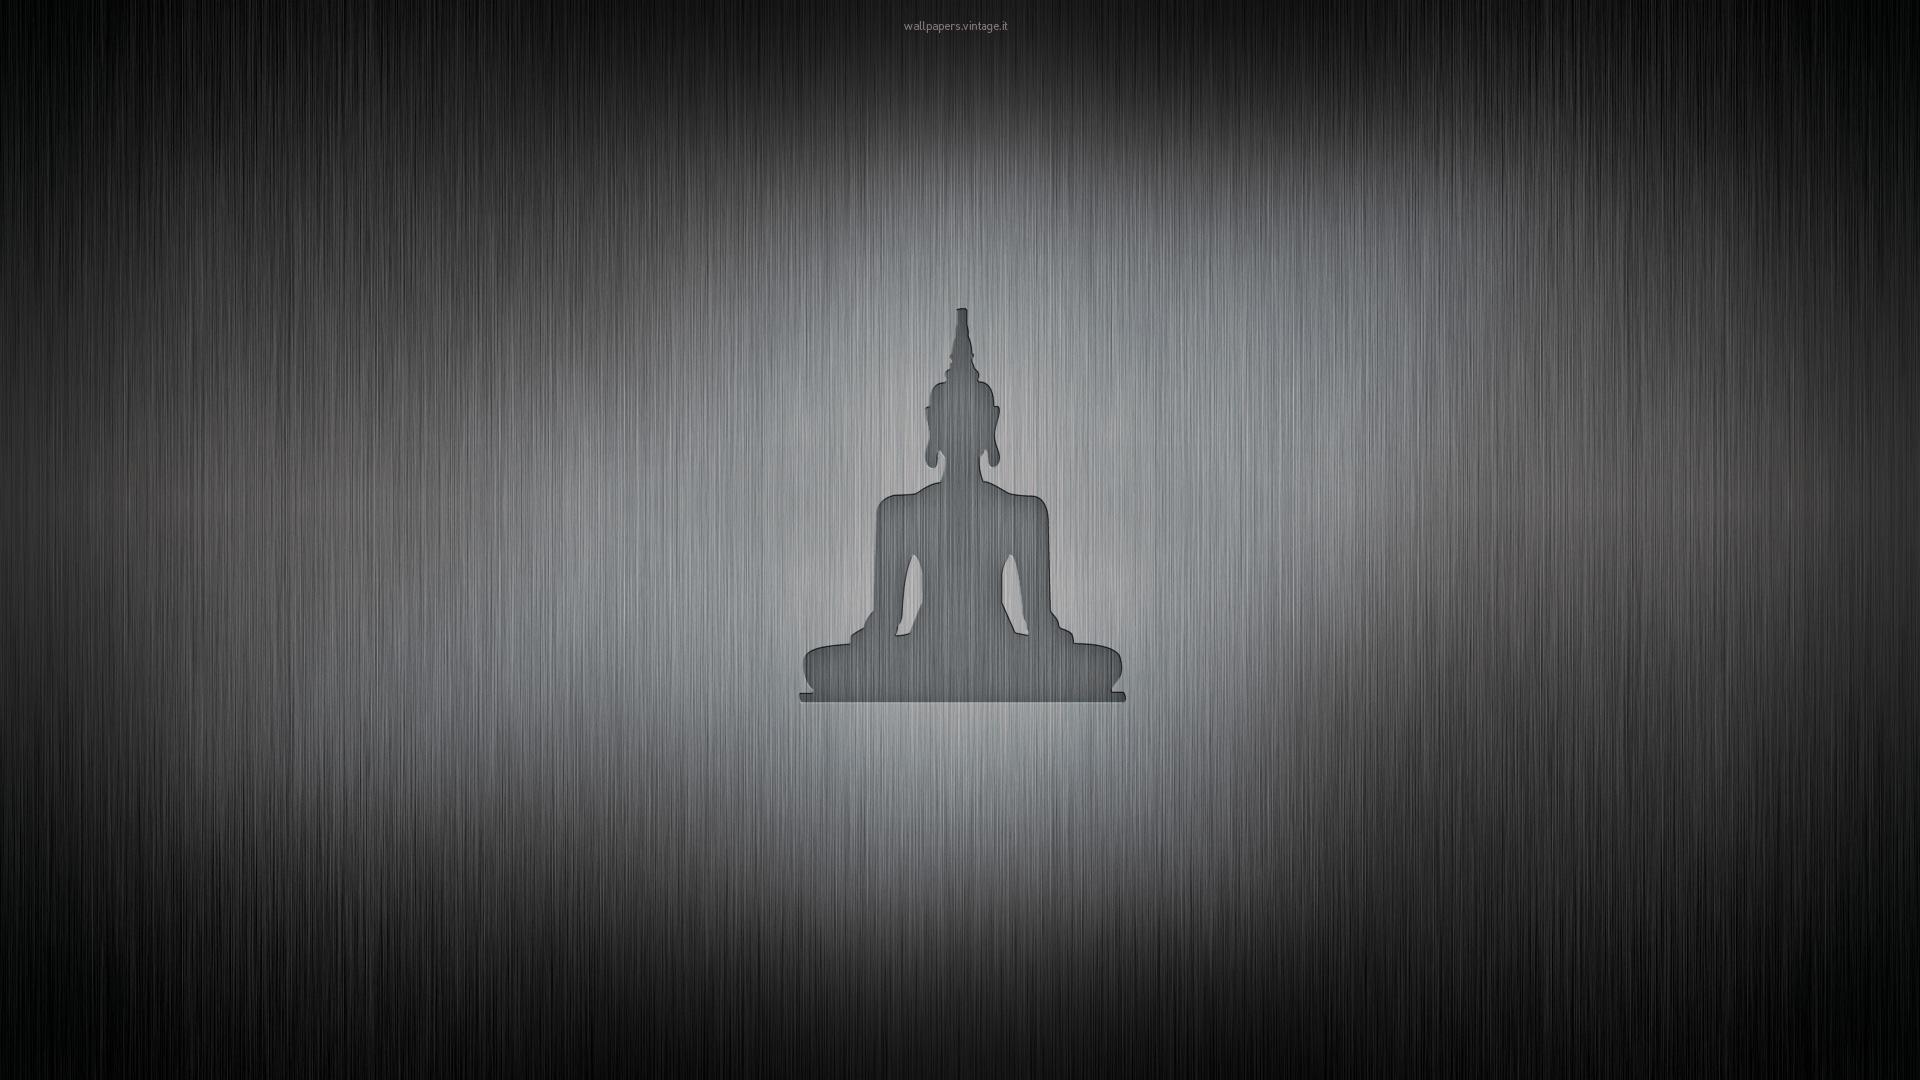 Buddha wallpaper   Desktop HD iPad iPhone wallpapers 1920x1080